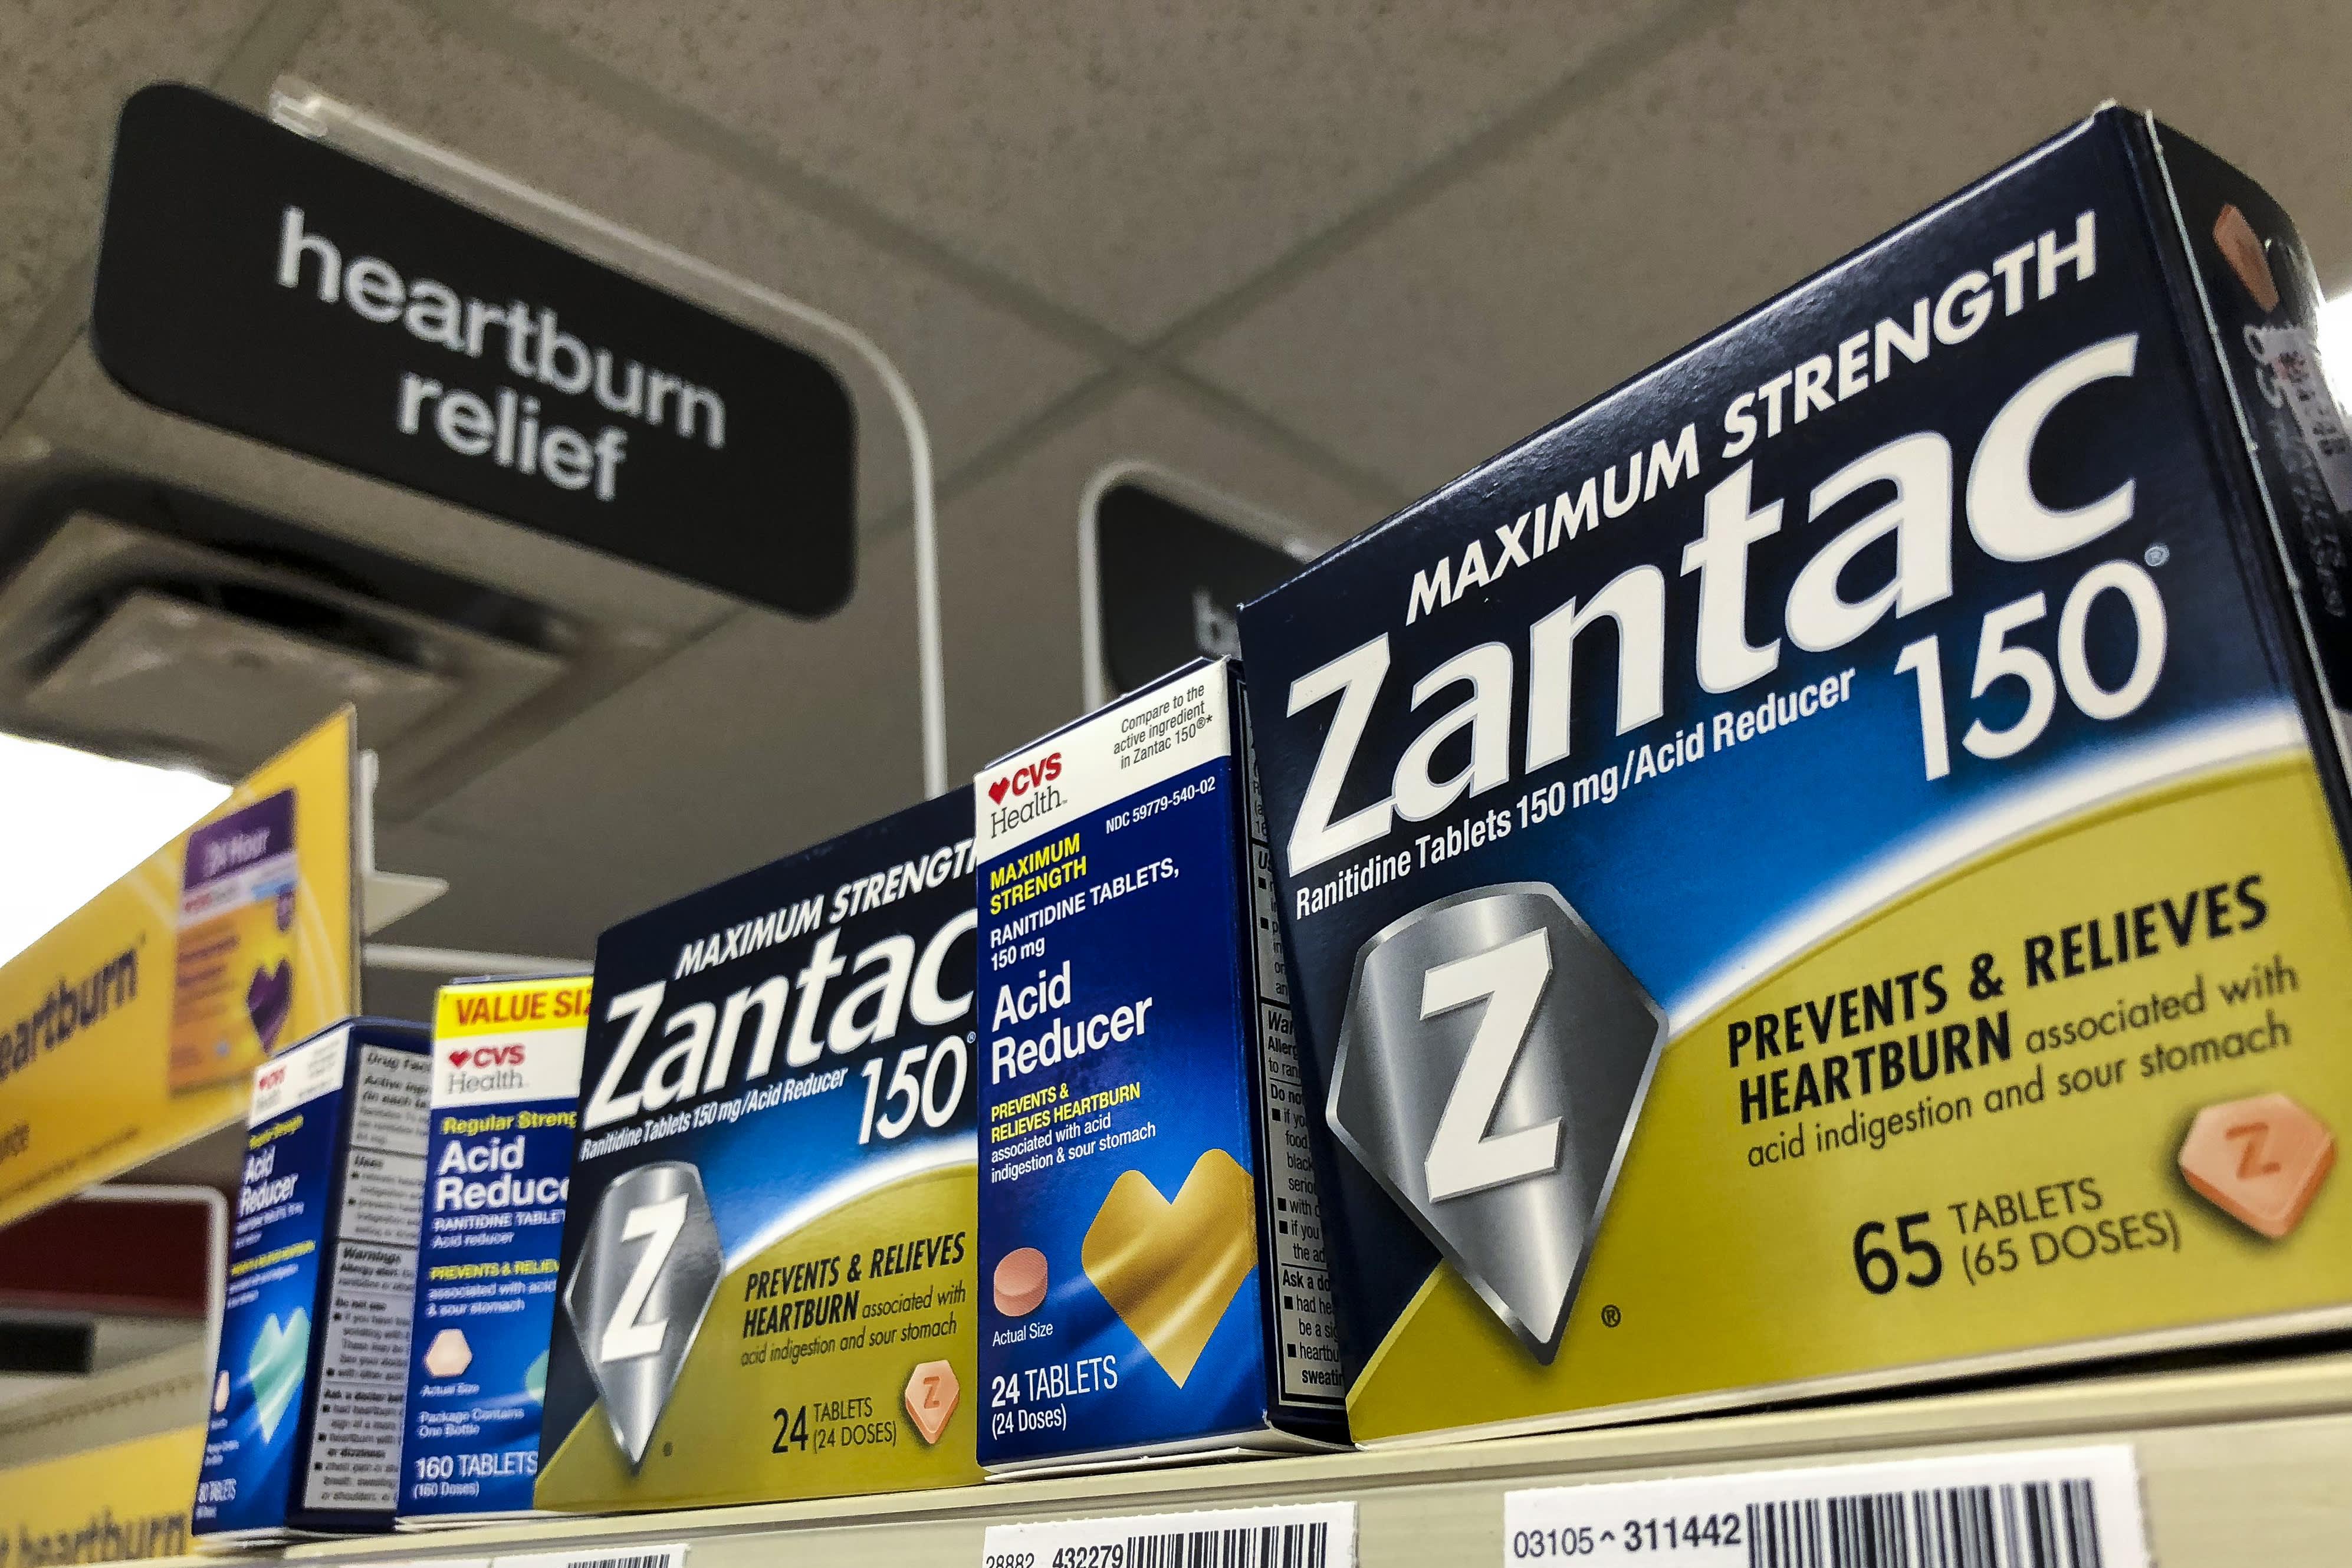 Walgreens joins CVS in suspending sales of heartburn medicine Zantac during safety review